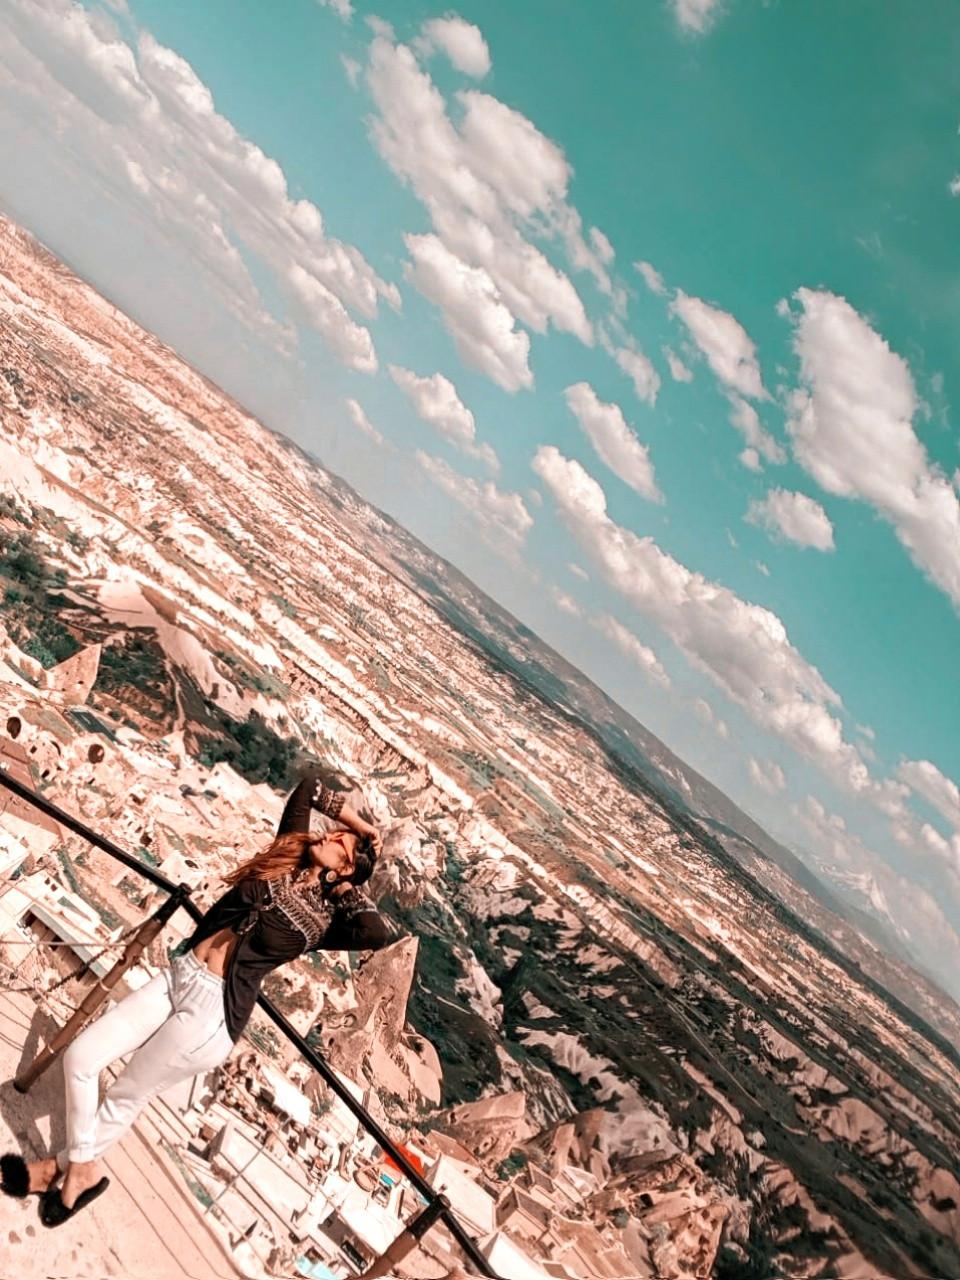 how to get to cappadocia,cappadocia map,cappadocia balloon, cappadocia turkey map, cappadocia hotels, cappadocia to istanbul, cappadocia pronunciation, cappadocia underground city,how to get to cappadocia, istanbul to cappadocia, cappadocia turkey, things to do in cappadocia, cappadocia hot air balloon, cappadocia map, cappadocia tours,thatnomadcouple, cappadocia hotels